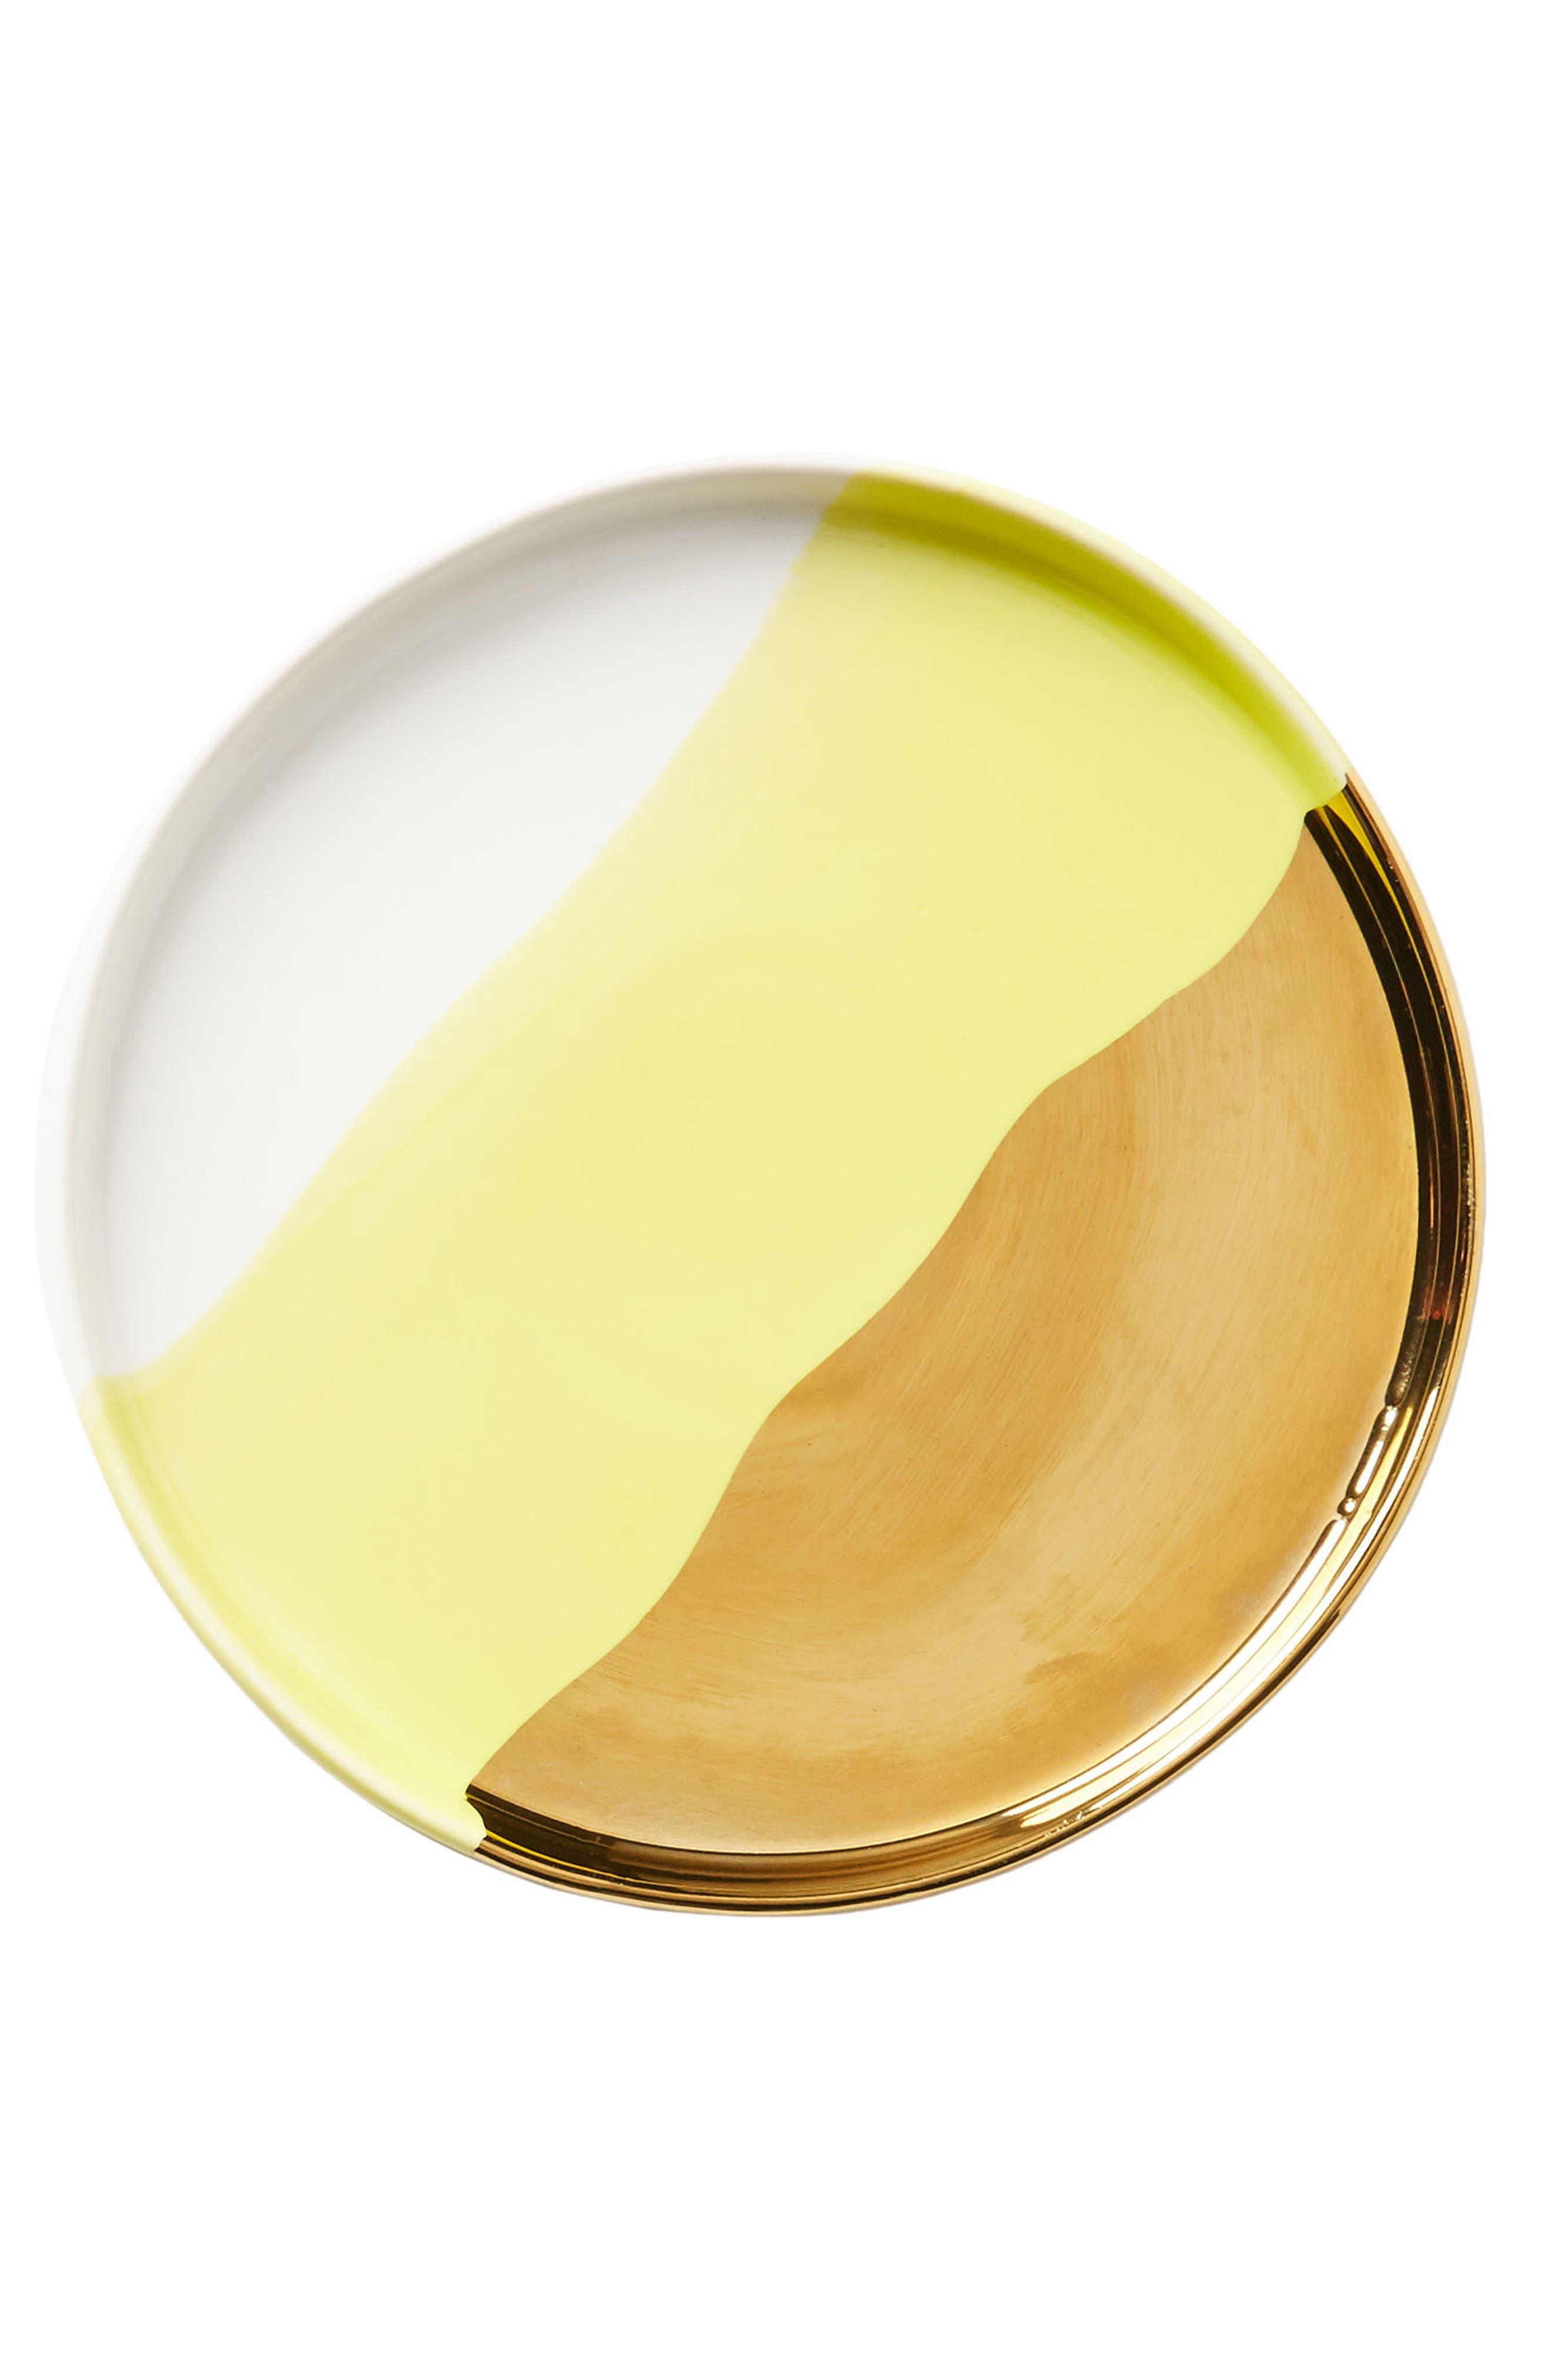 Tamatoa Side Plate,                             Alternate thumbnail 6, color,                             Chartreuse